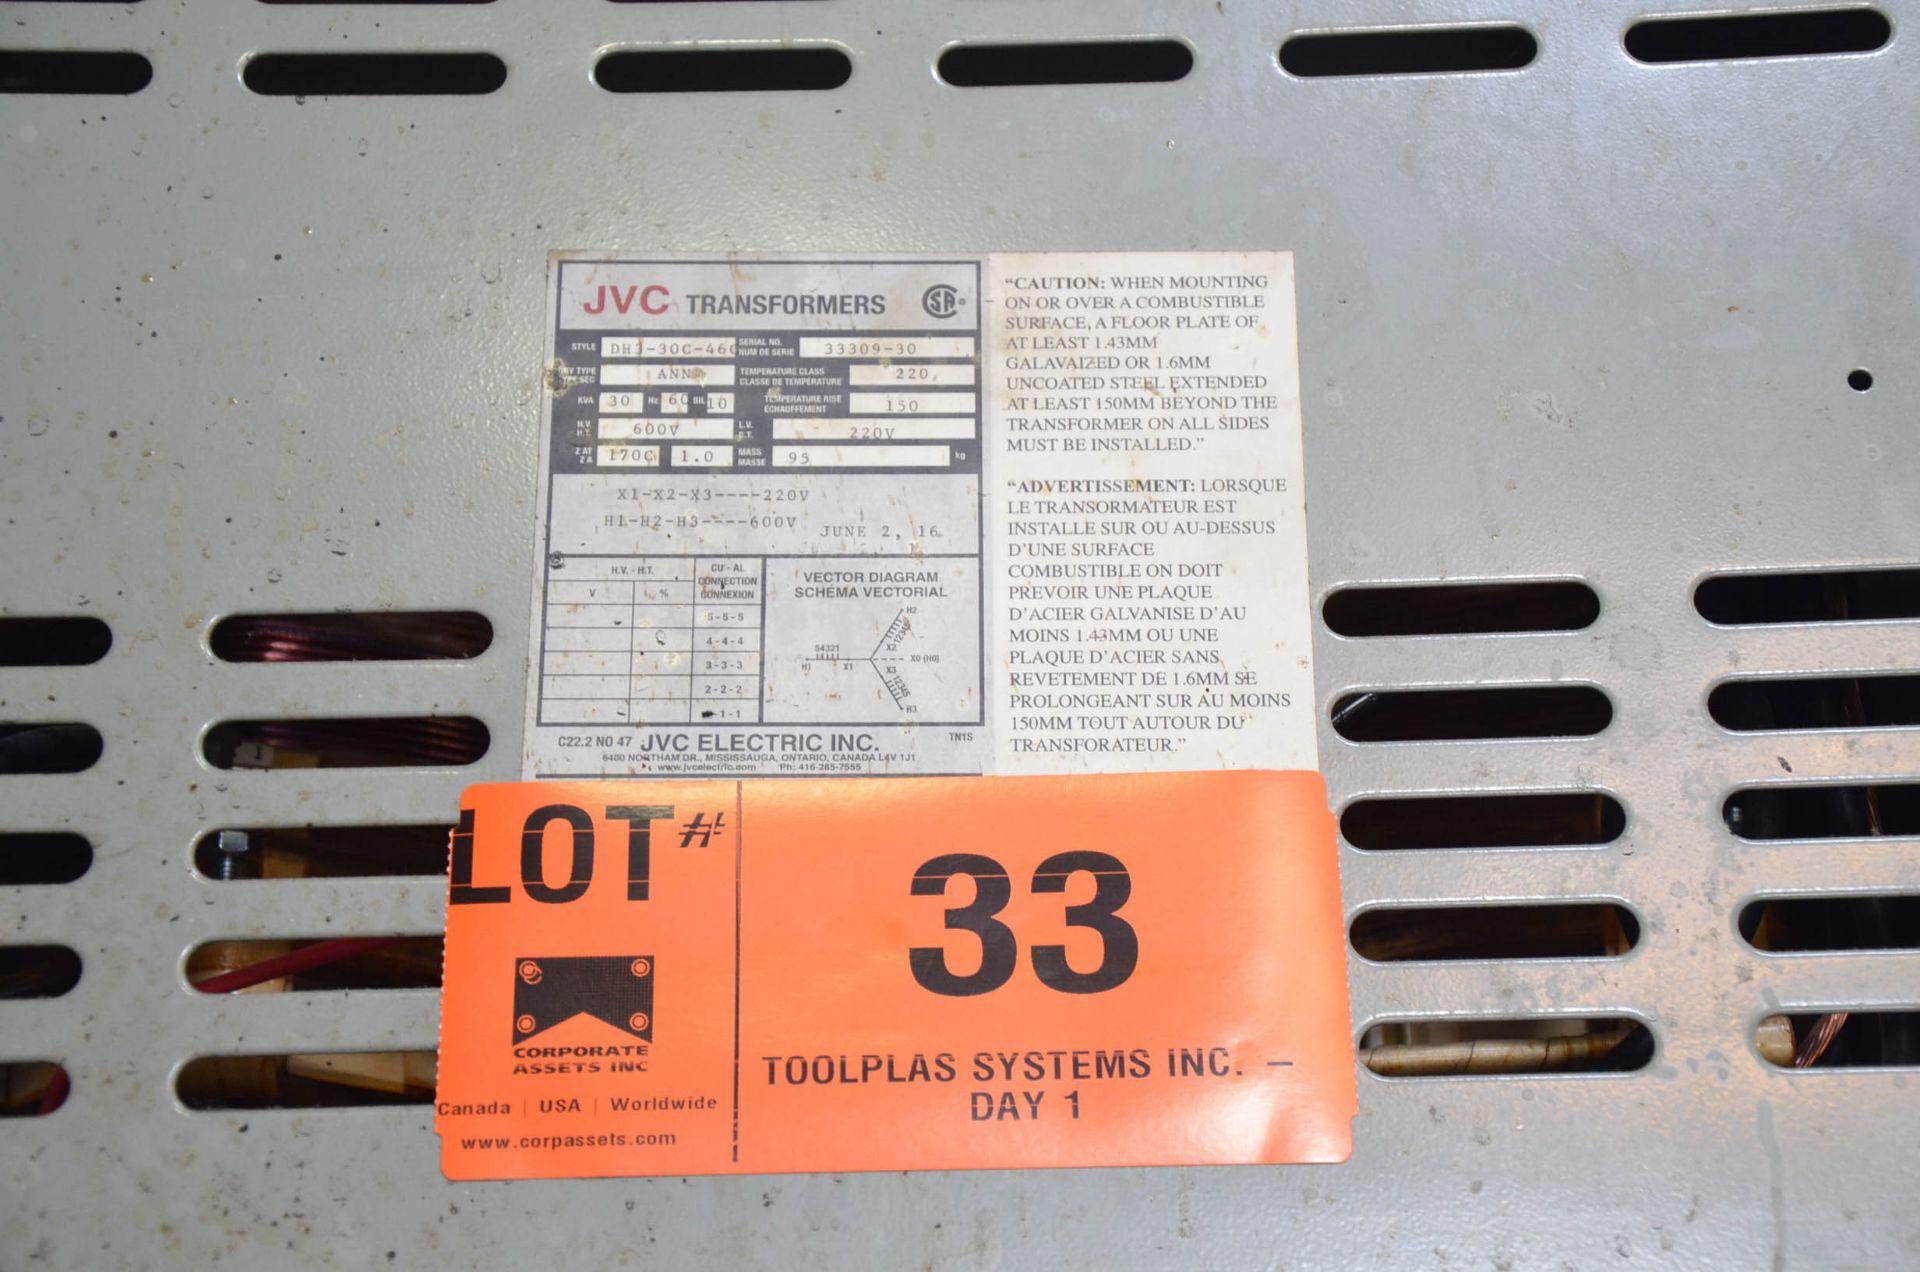 JVC 30KVA/600-220V/3PH/60HZ TRANSFORMER (CI) [RIGGING FEES FOR LOT #33 - $50 USD PLUS APPLICABLE - Image 2 of 2